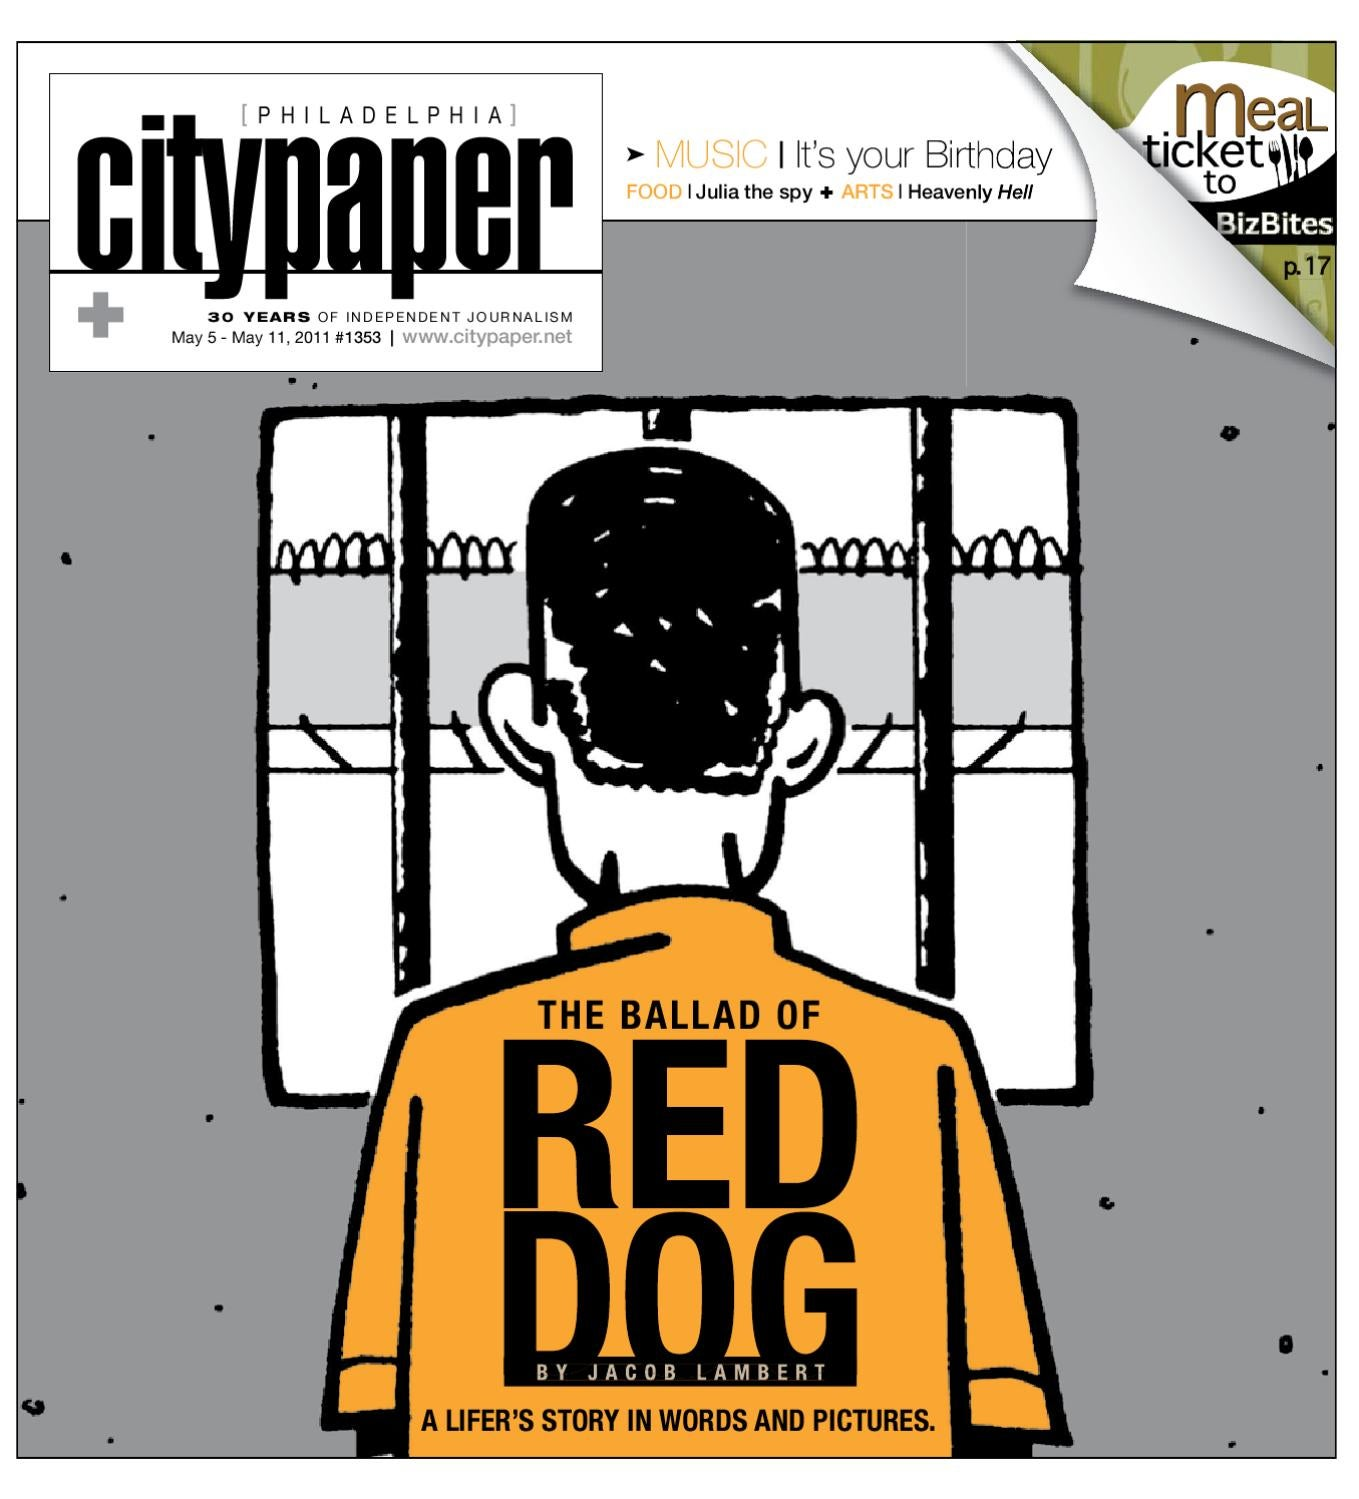 Phila city paper